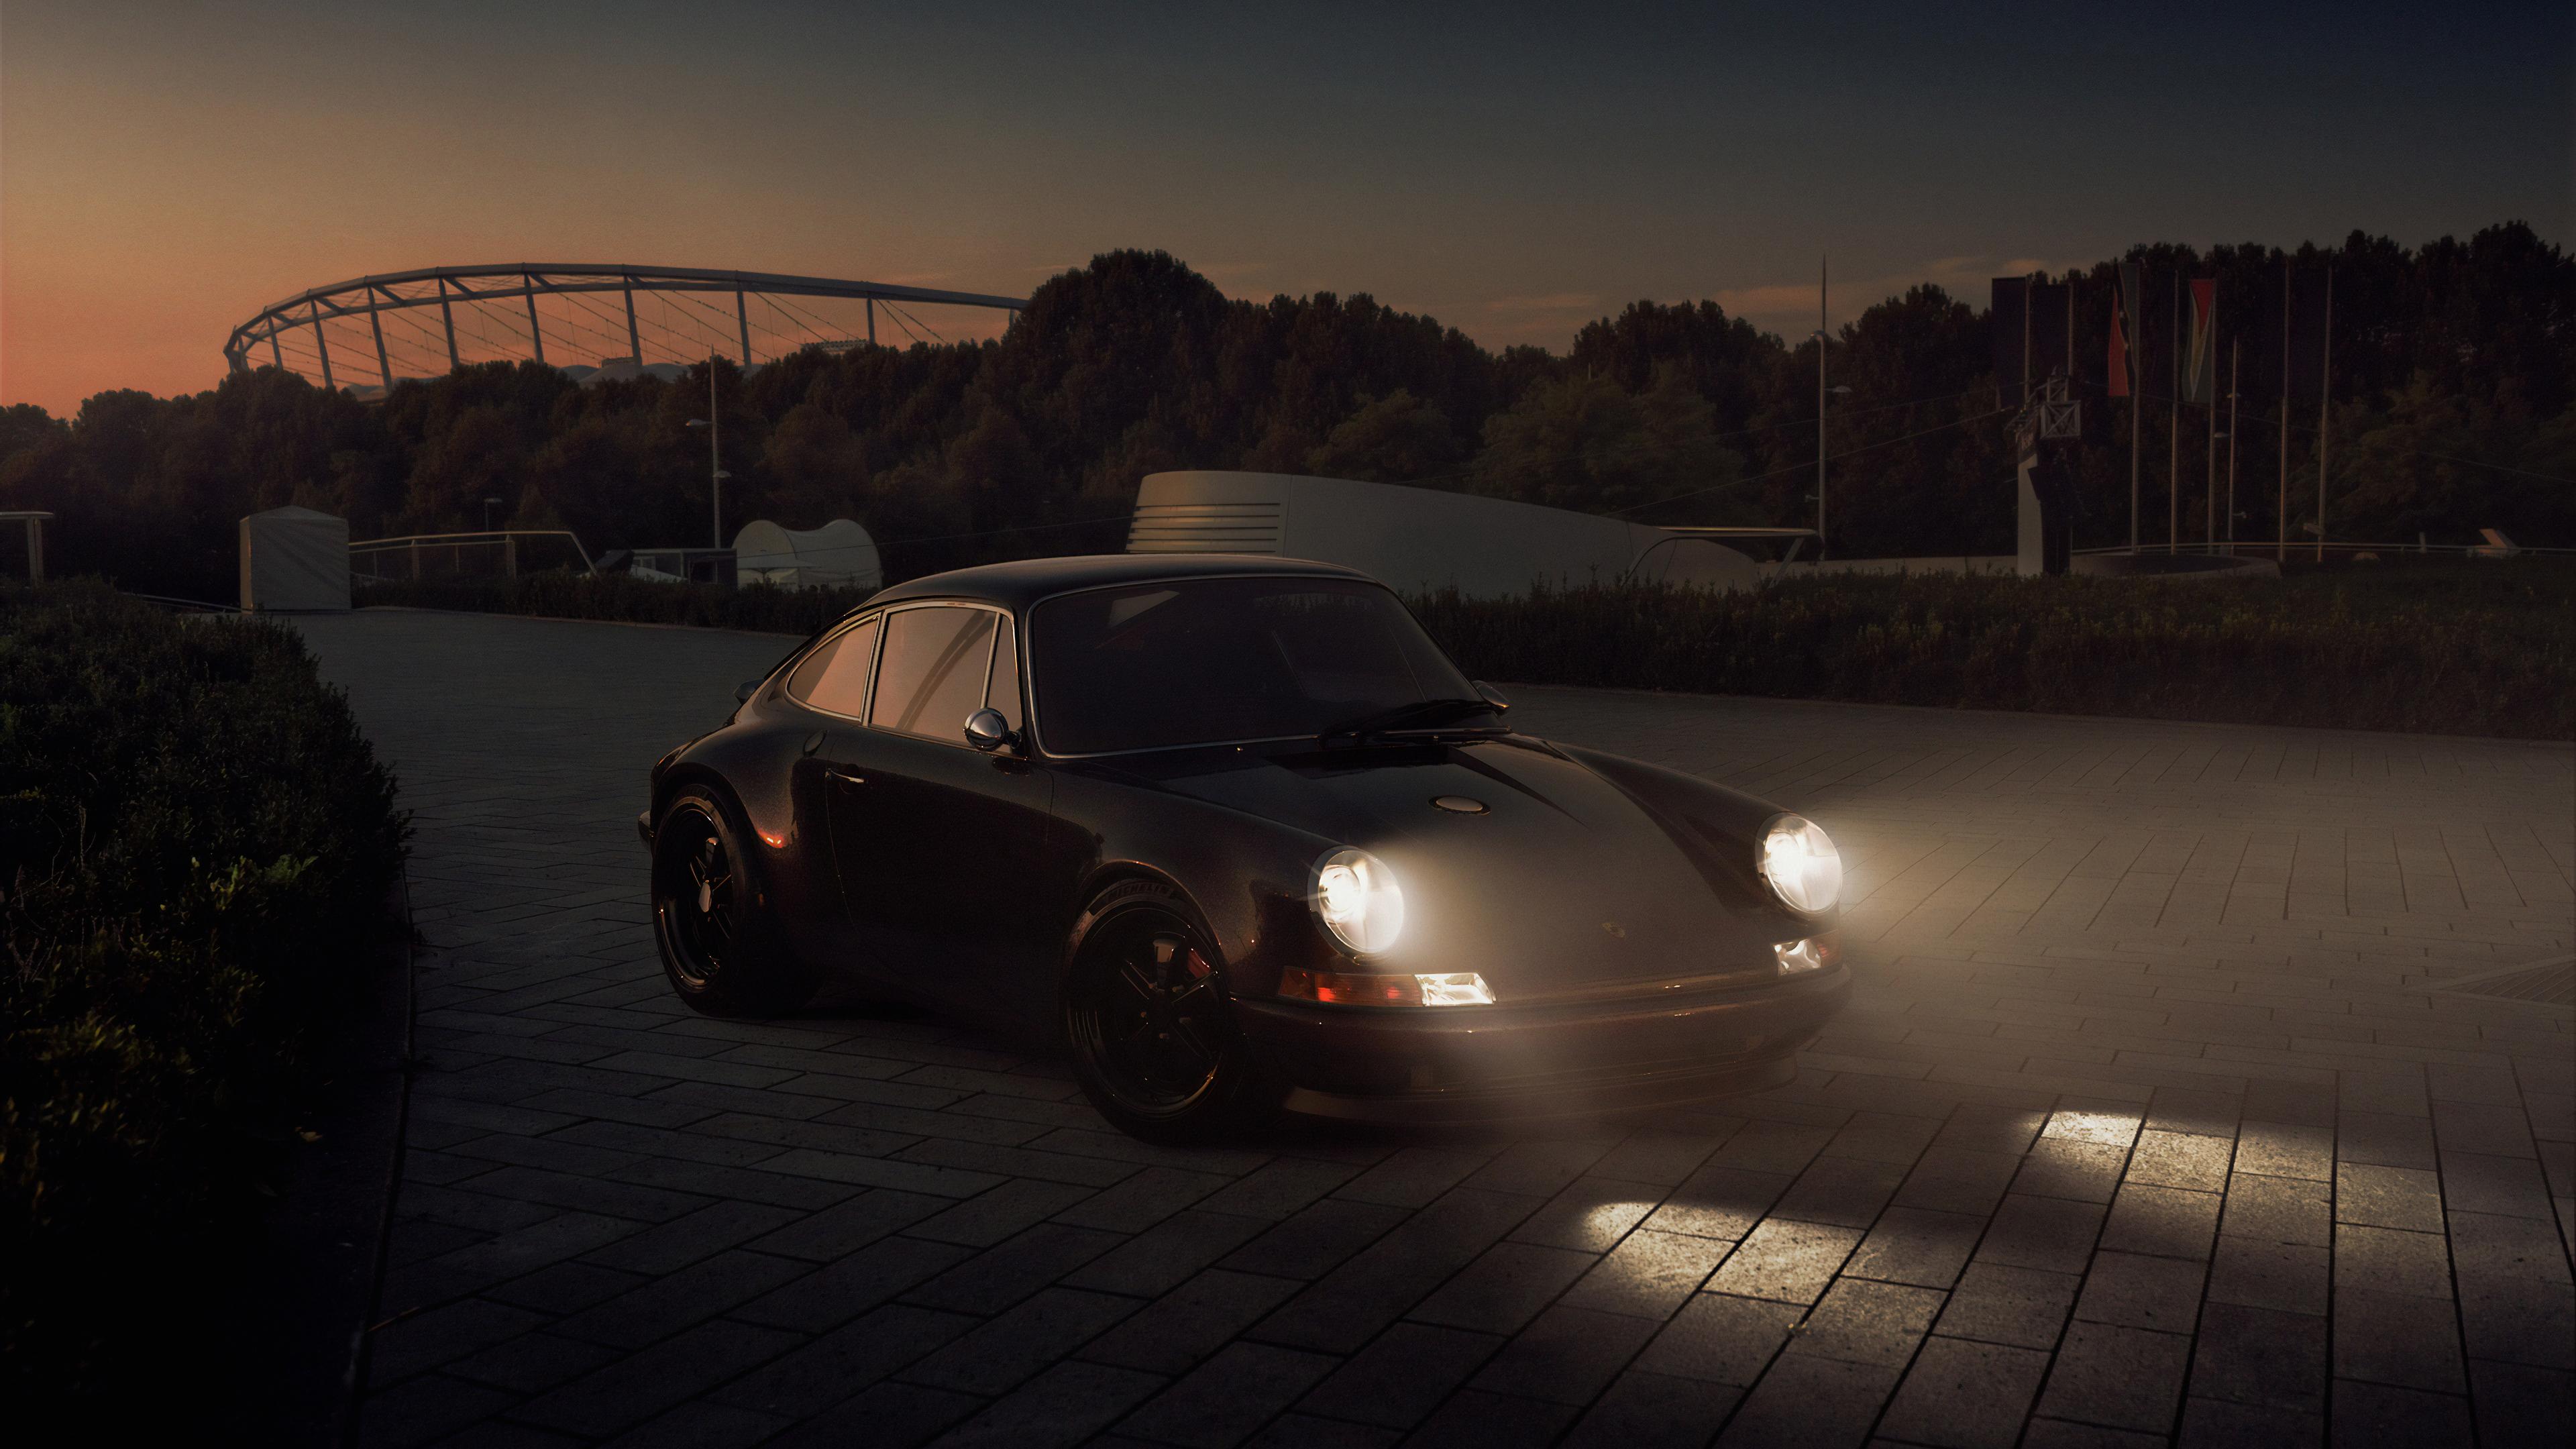 porsche in night 1565054841 - Porsche In Night - porsche wallpapers, hd-wallpapers, cars wallpapers, 4k-wallpapers